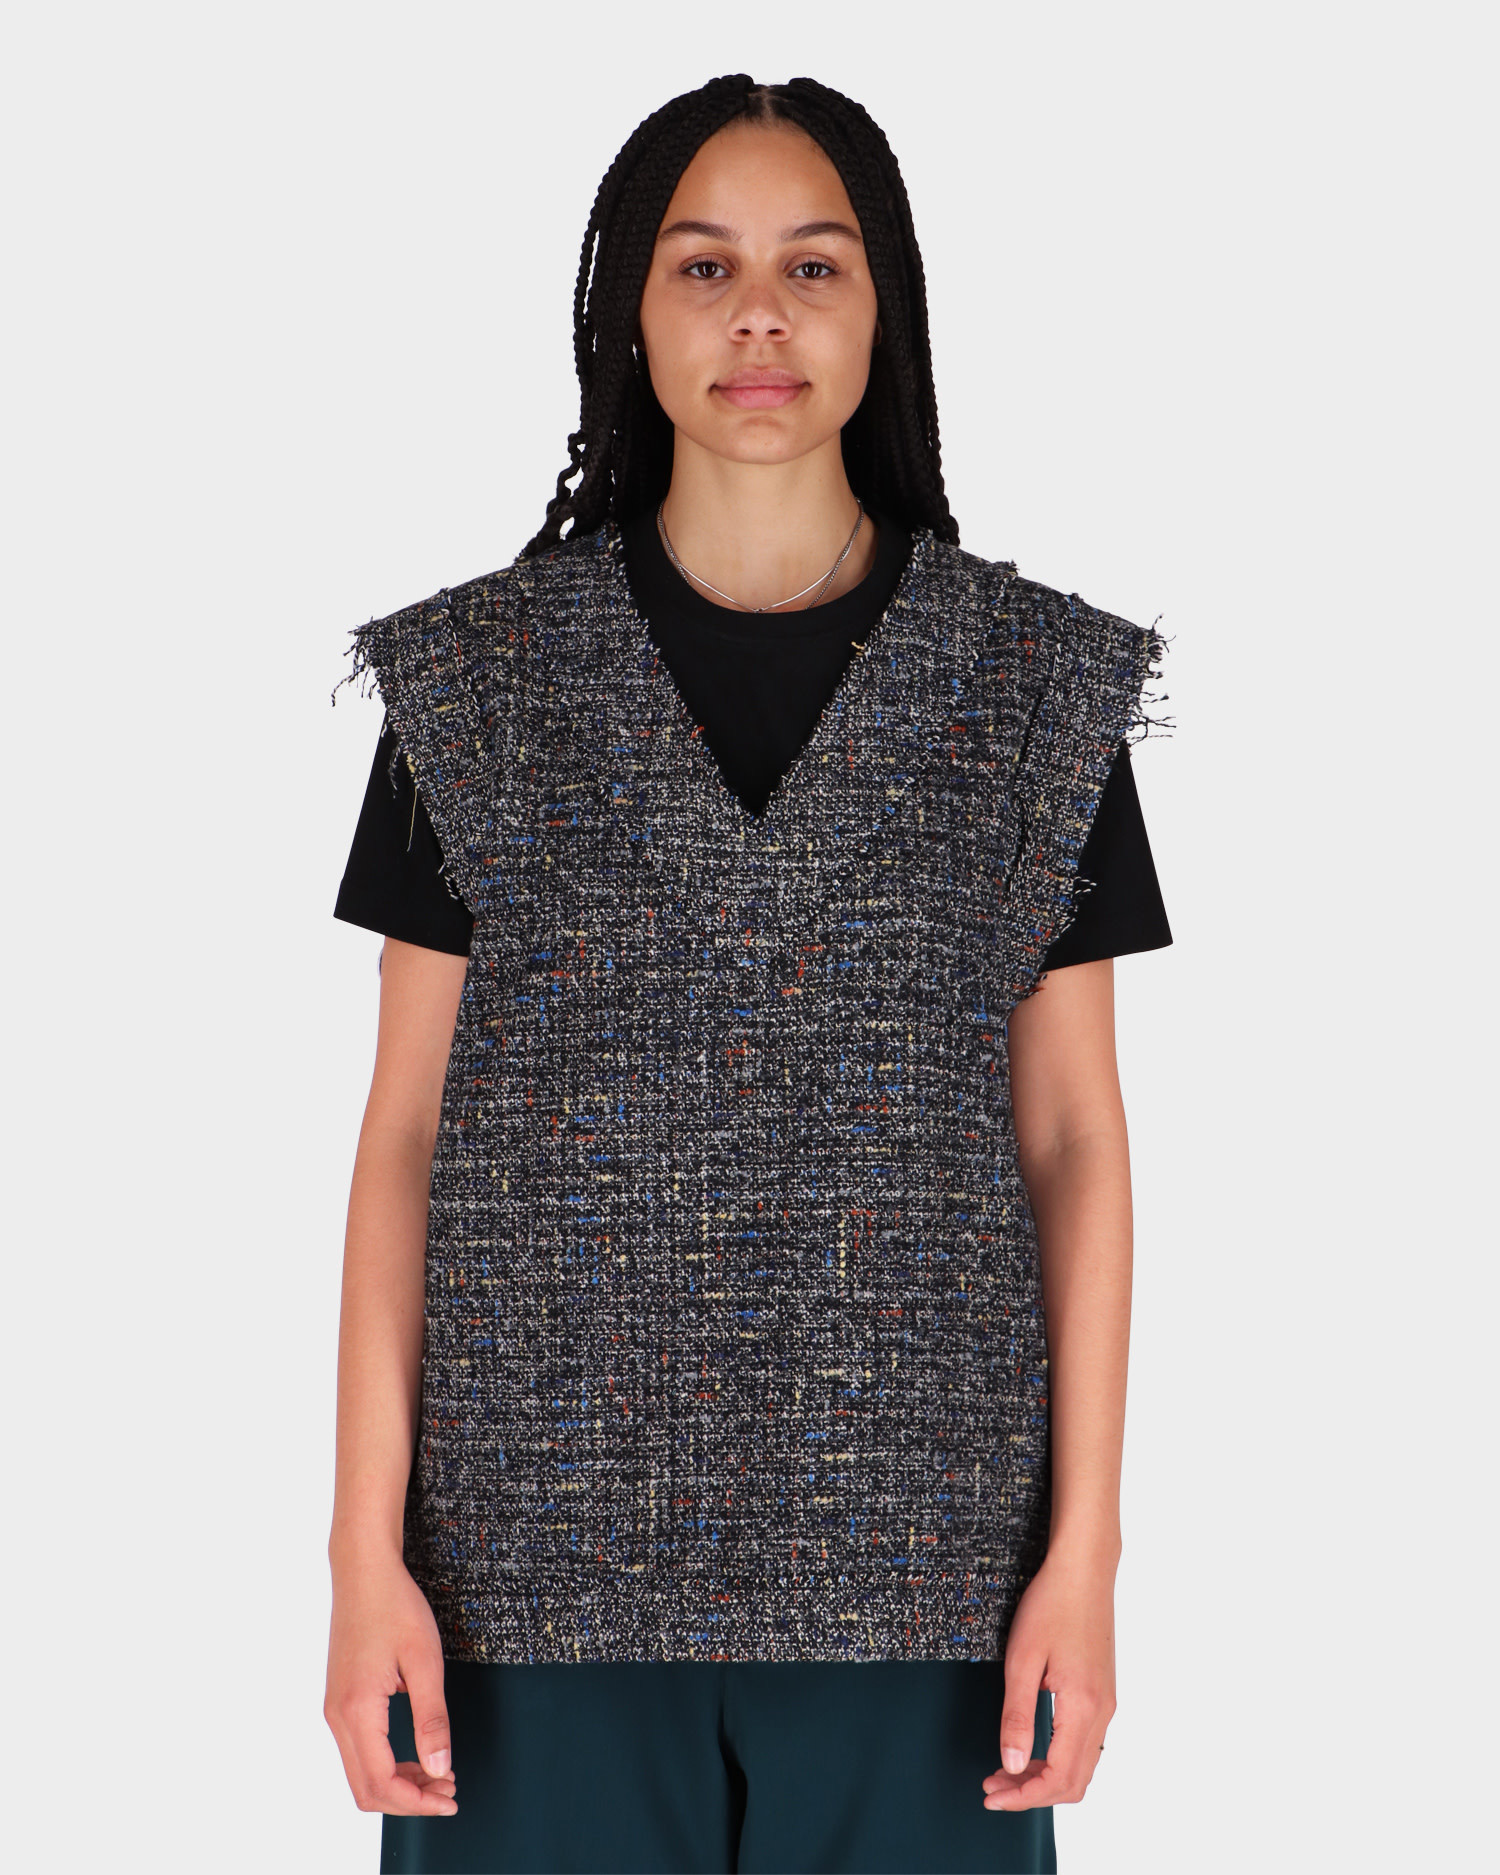 Neige Boucle Vest Grey/Multi